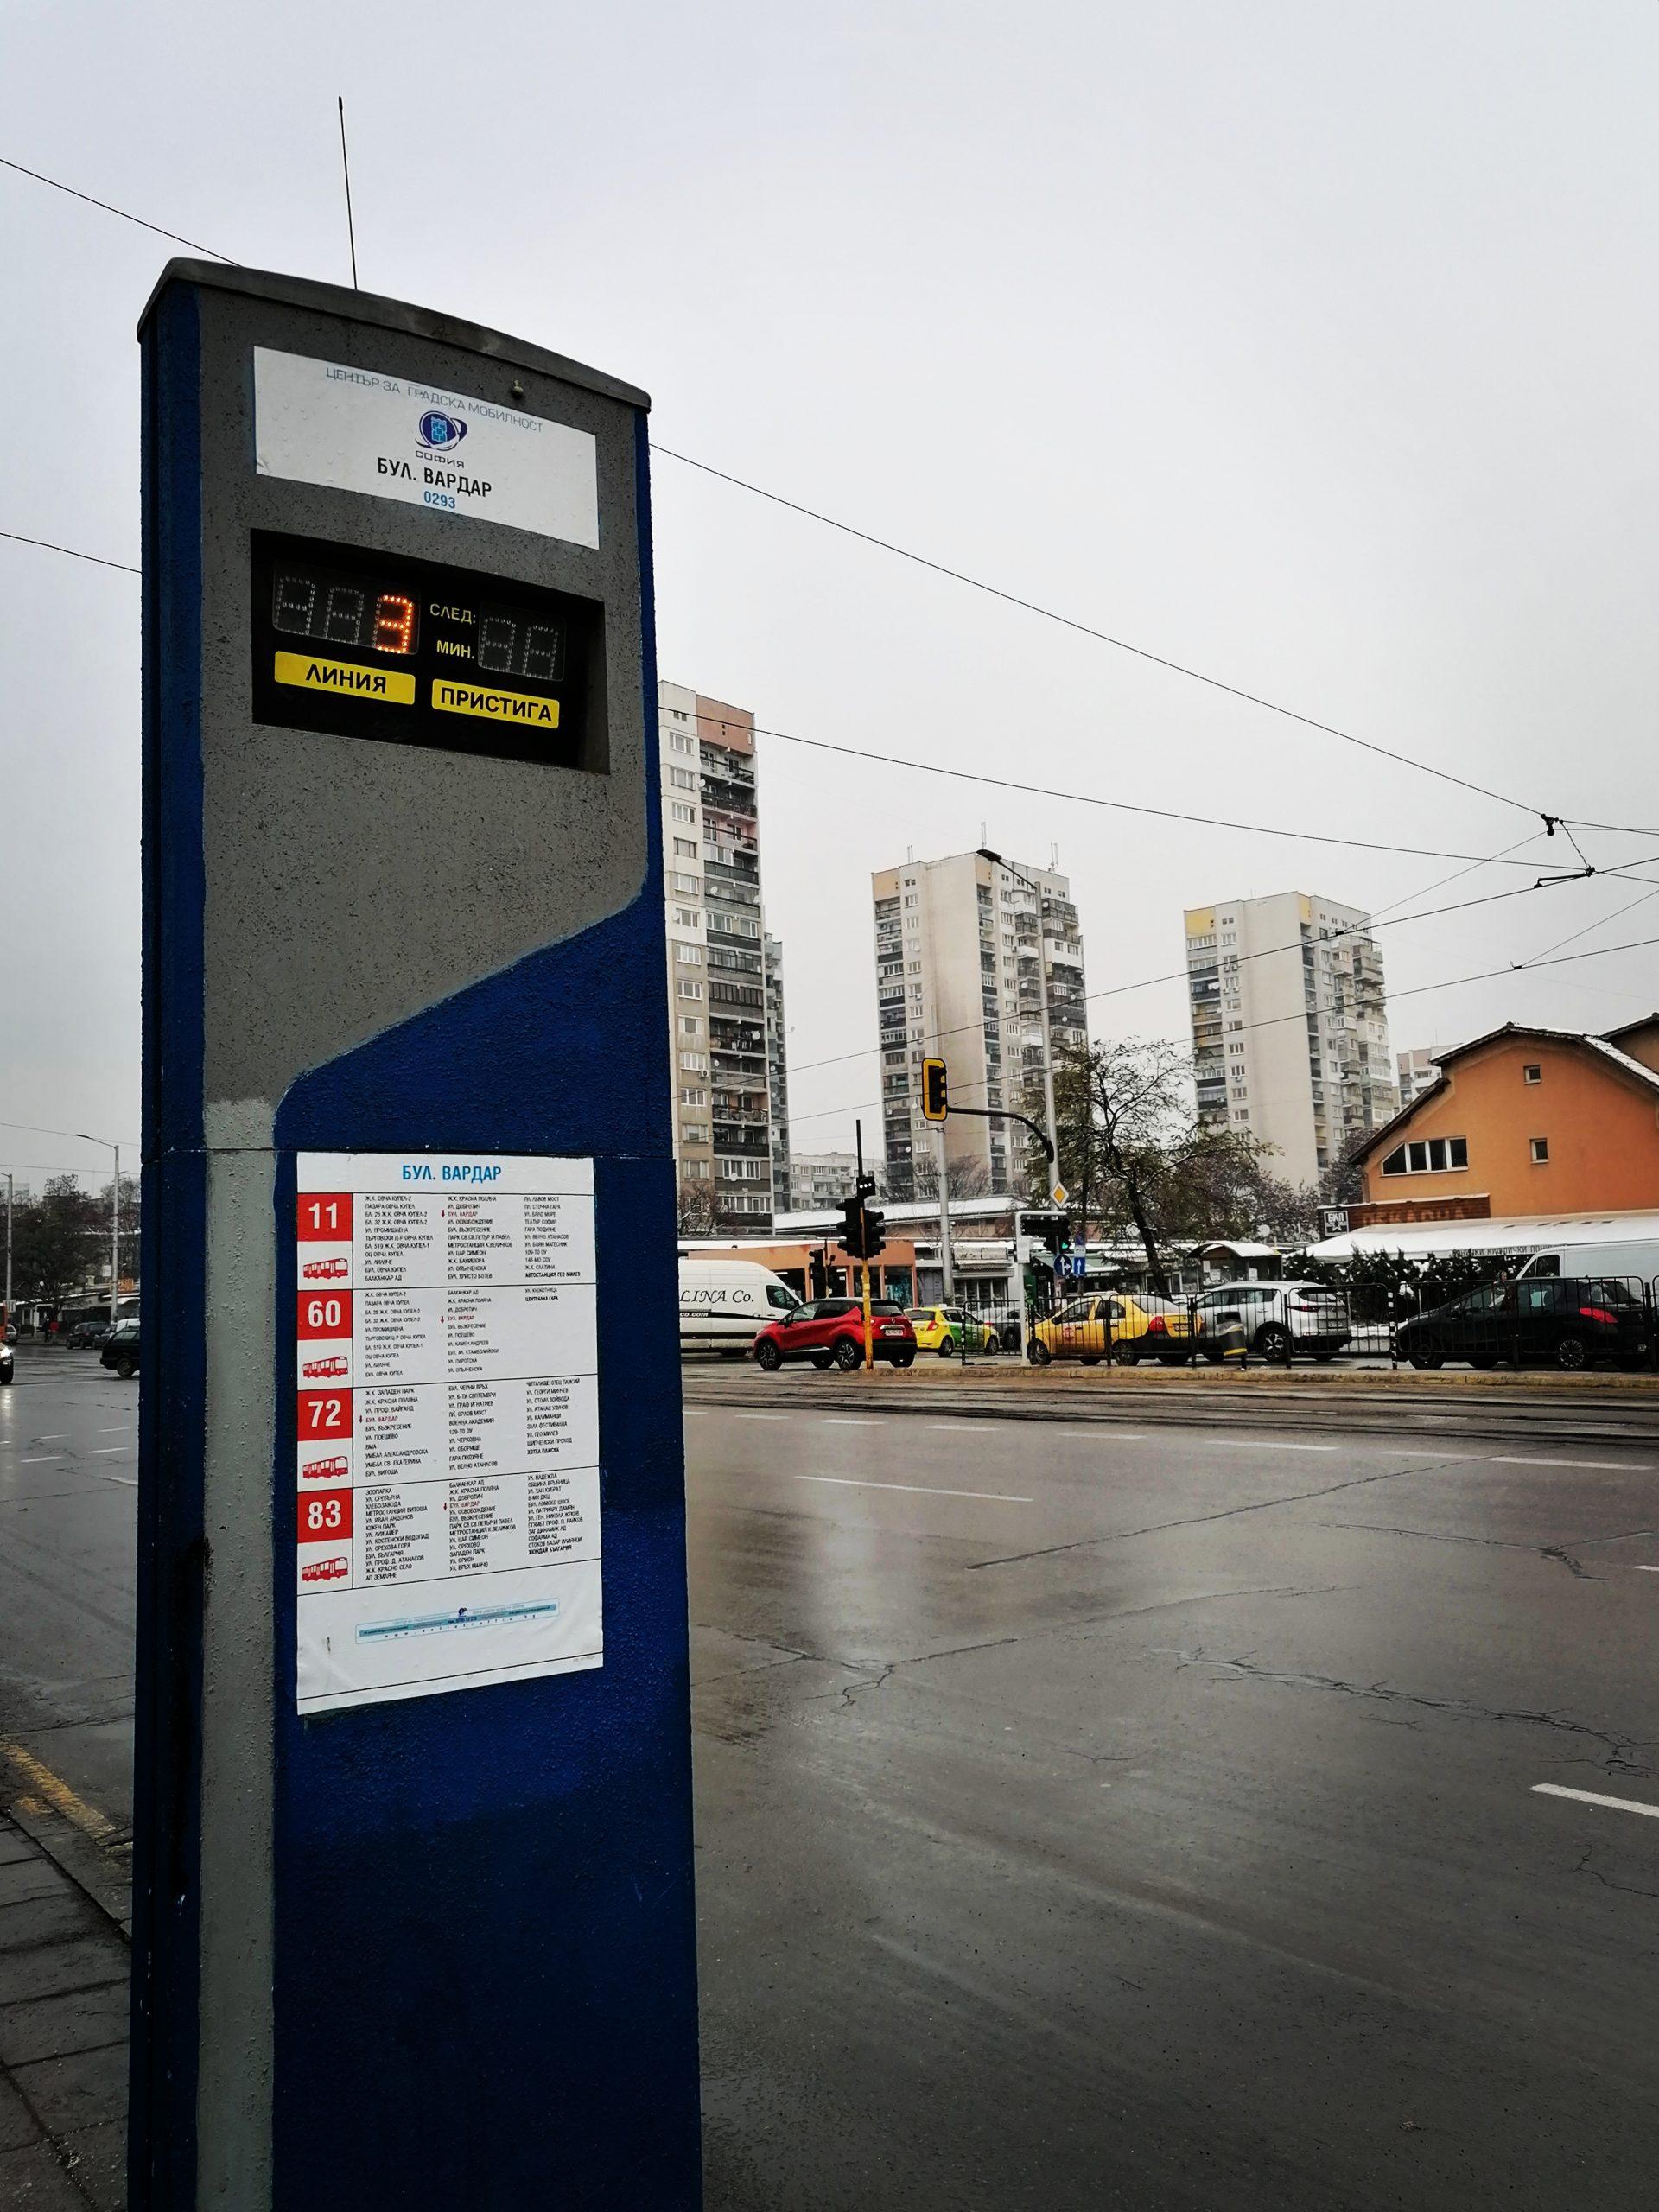 София: линия 76 в променен машрут в района на Младост 4